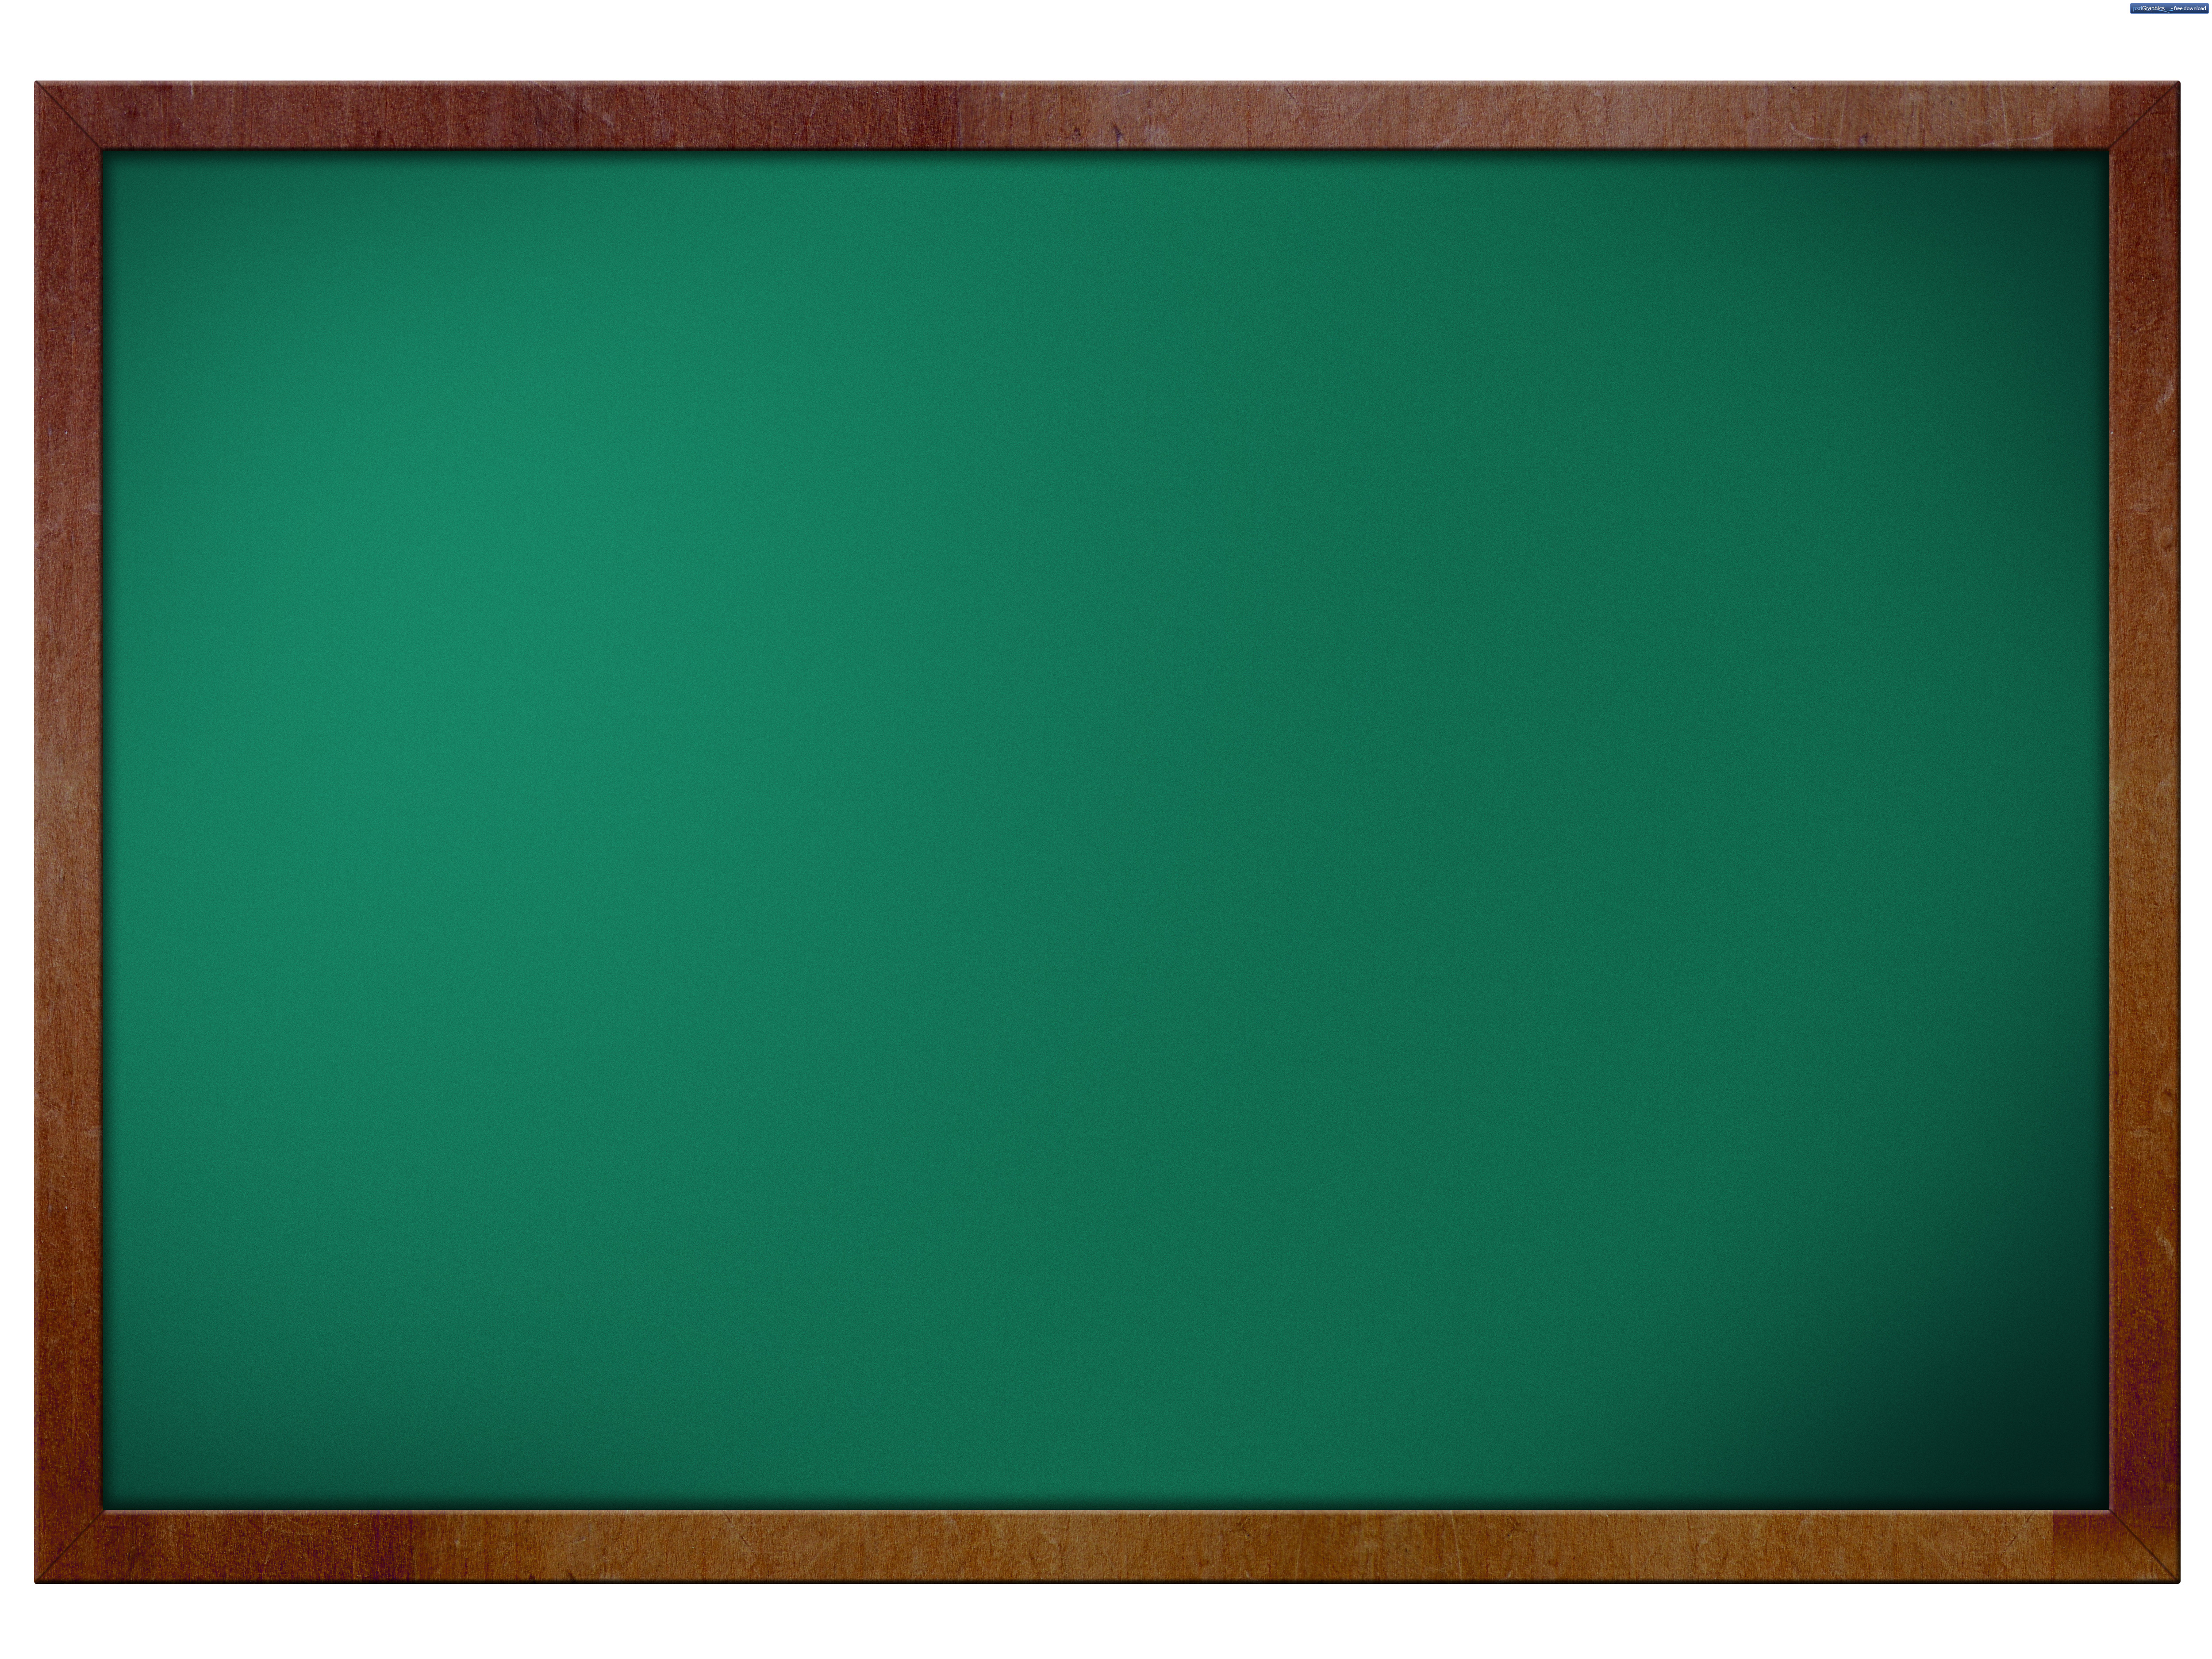 Free Chalk Board, Download Free Clip Art, Free Clip Art on Clipart.